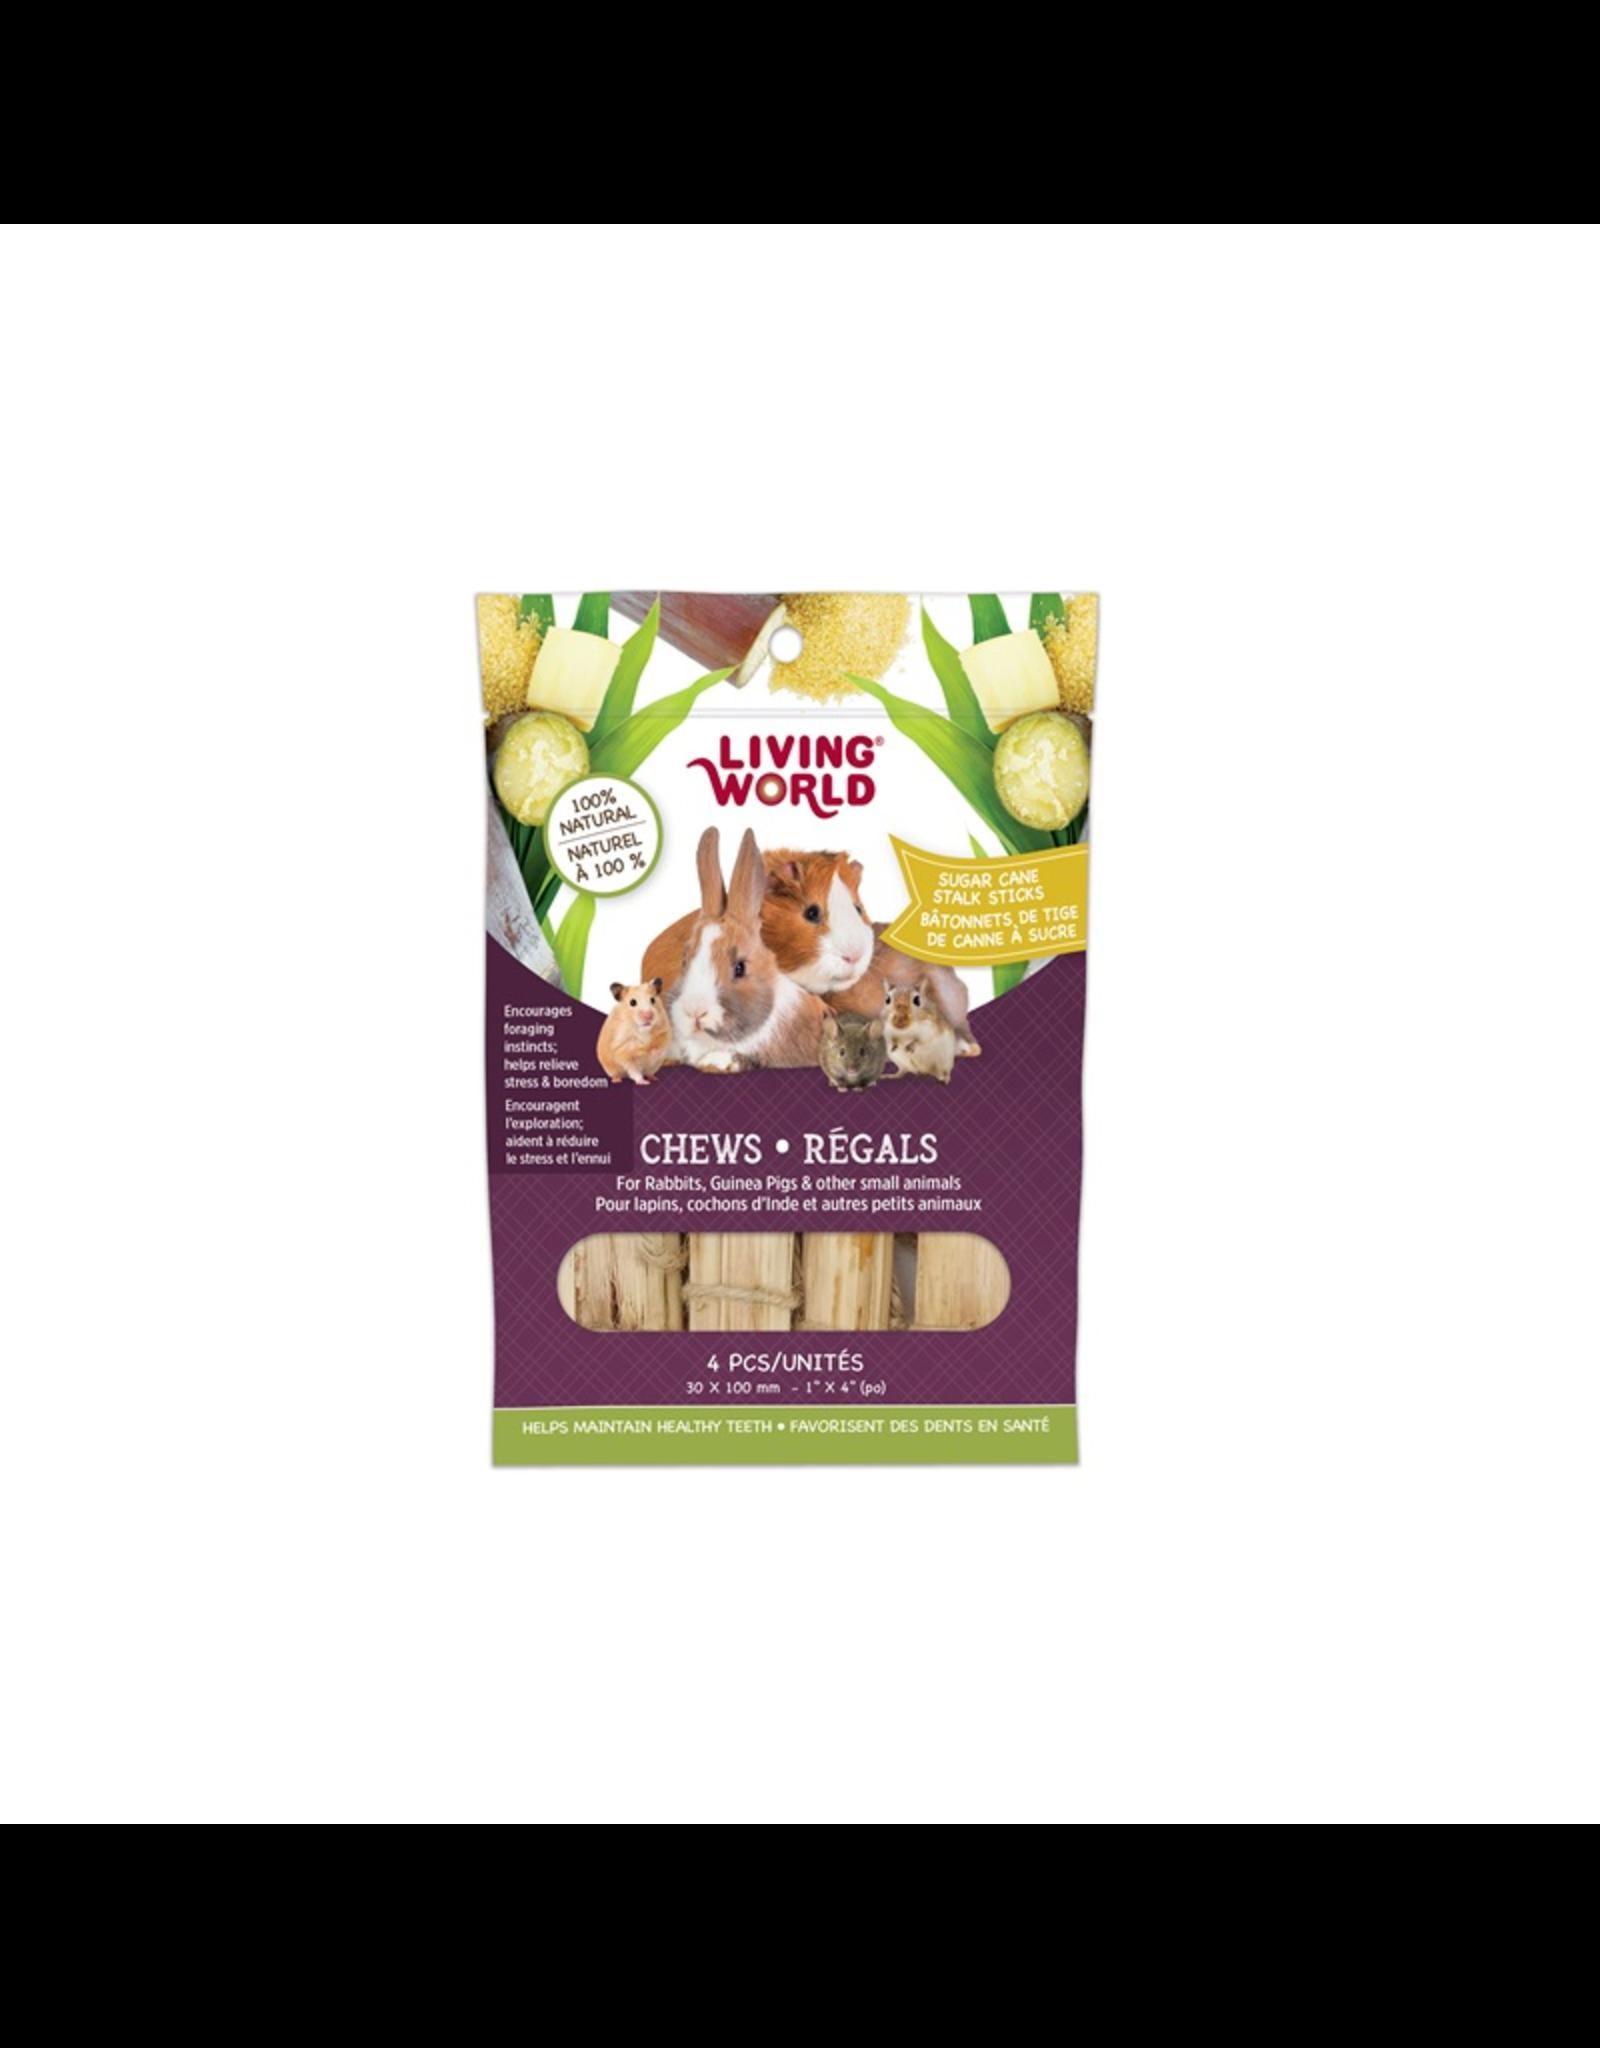 Living World Living World Small Animal Chews - Sugarcane Stalk Sticks - 4 pieces